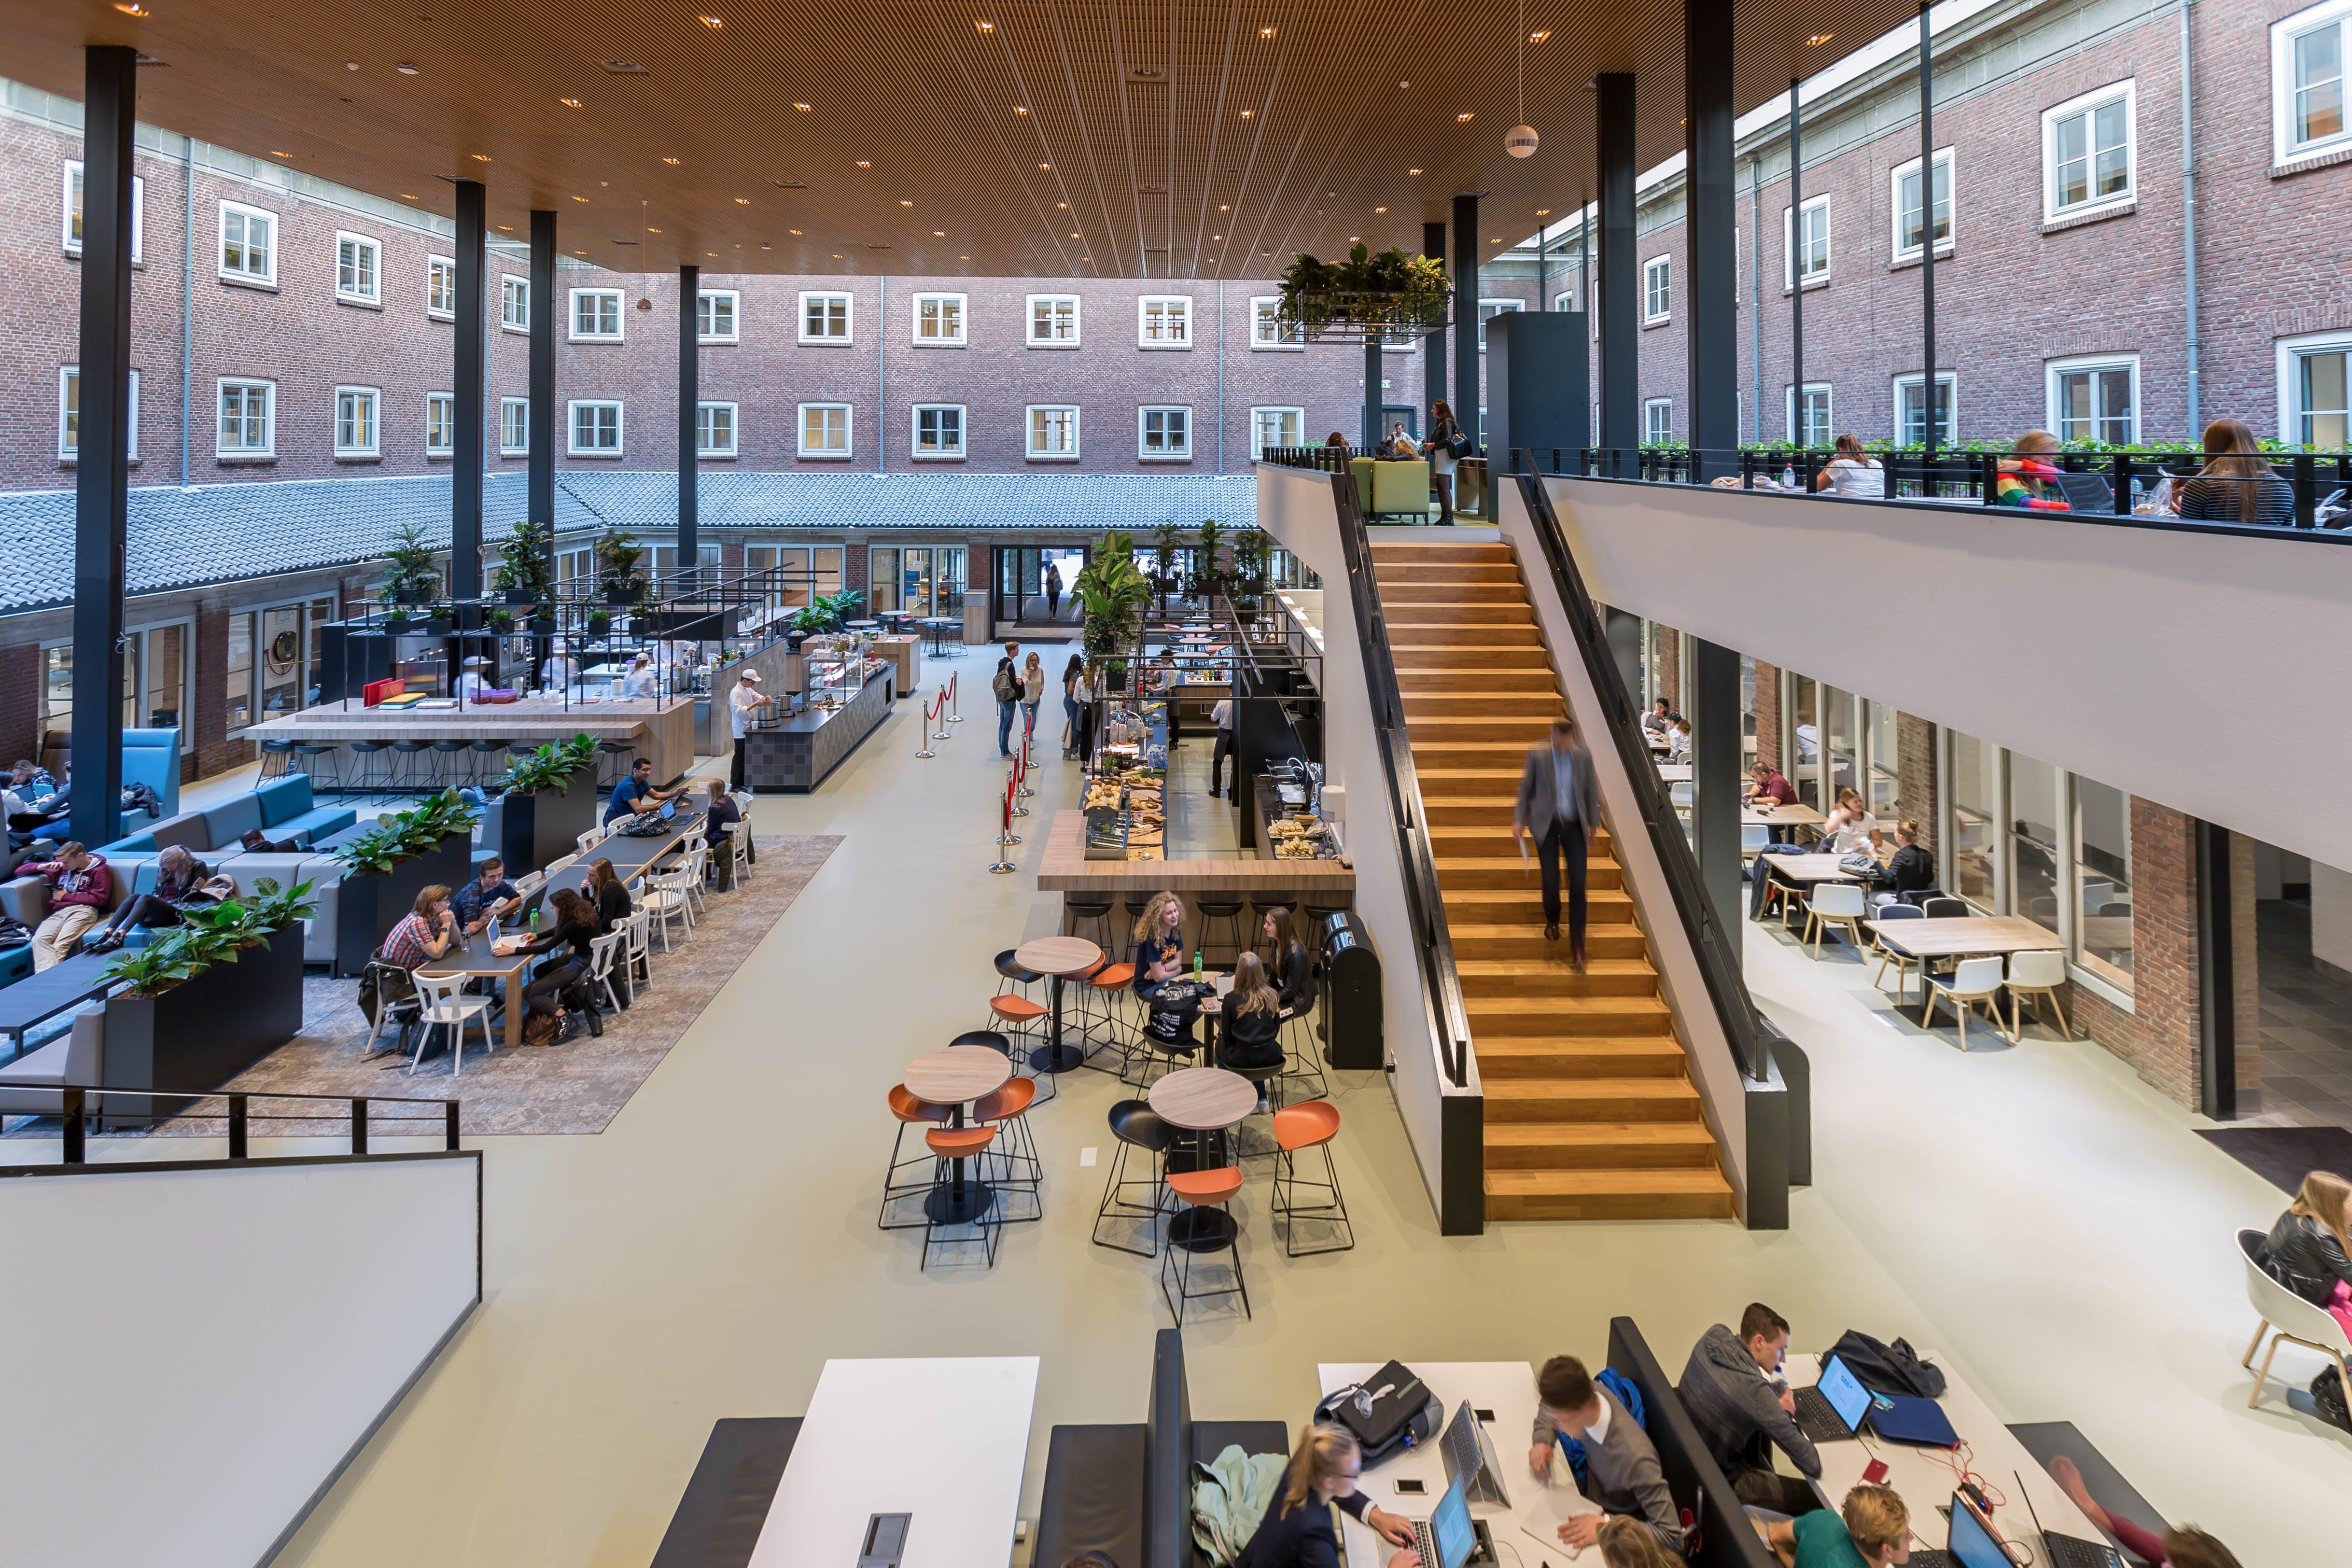 University Applied Sciences Netherlands